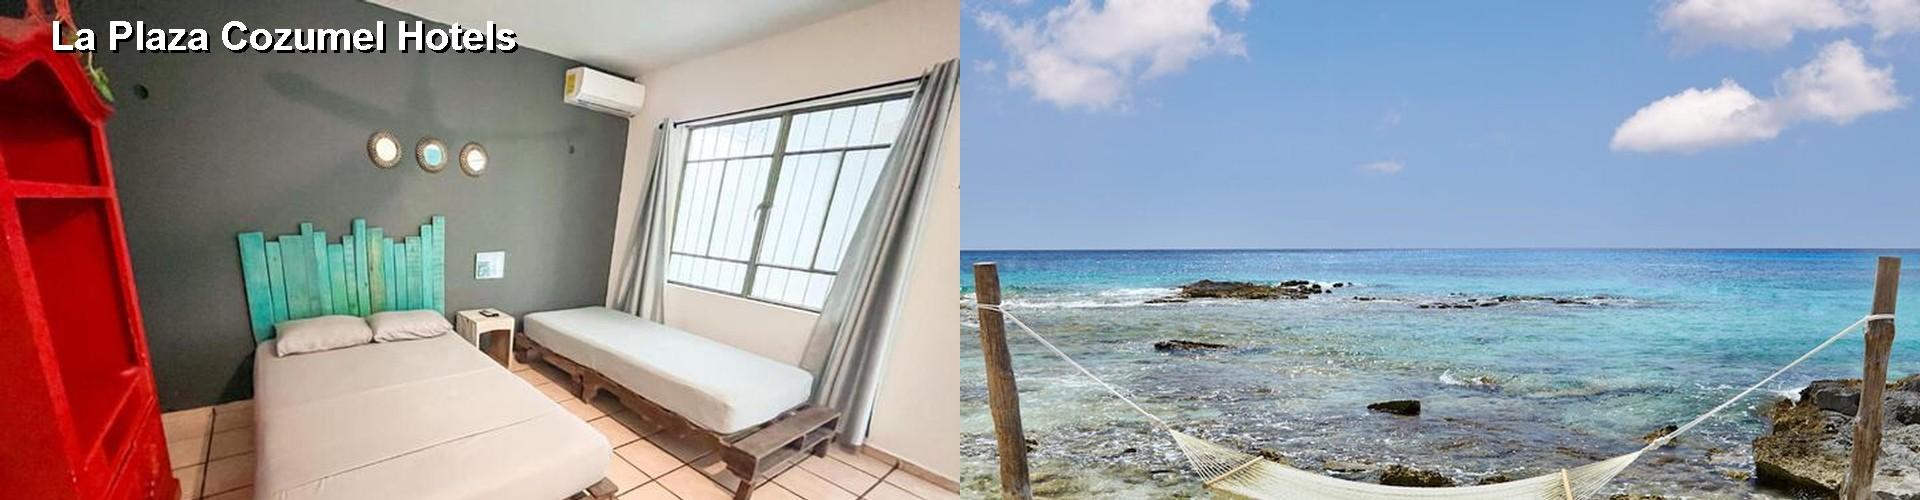 5 Best Hotels Near La Plaza Cozumel